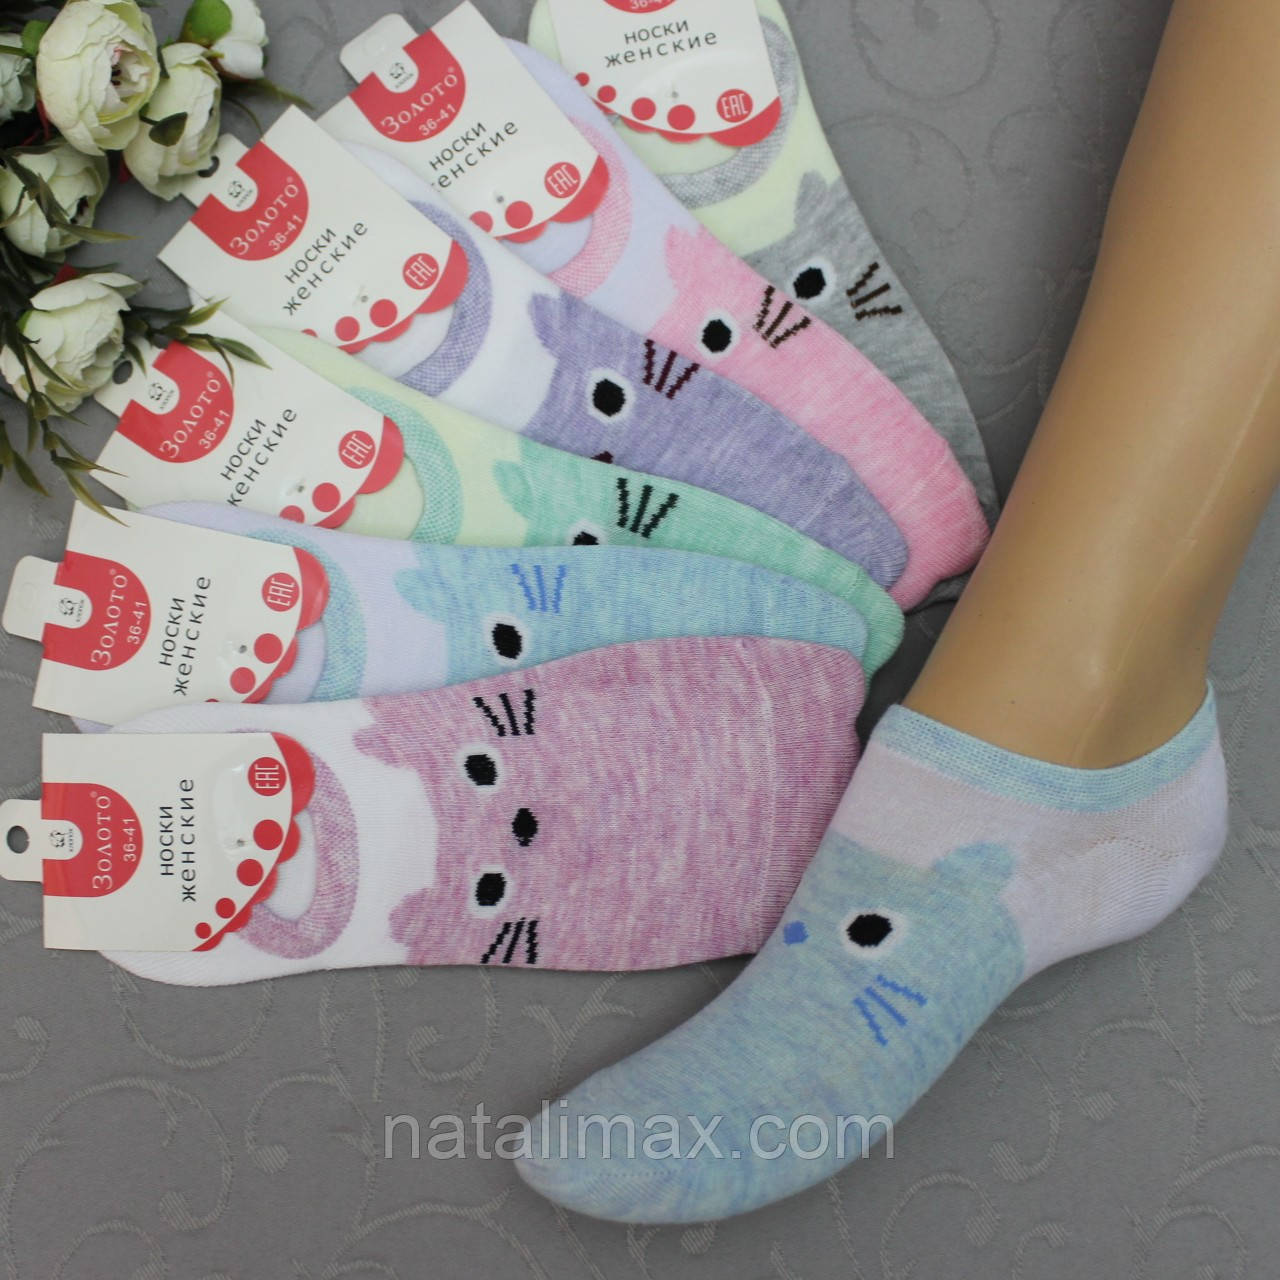 c455a899ca86 носки следы , следочки, подследники, носки мужские укороченные ...